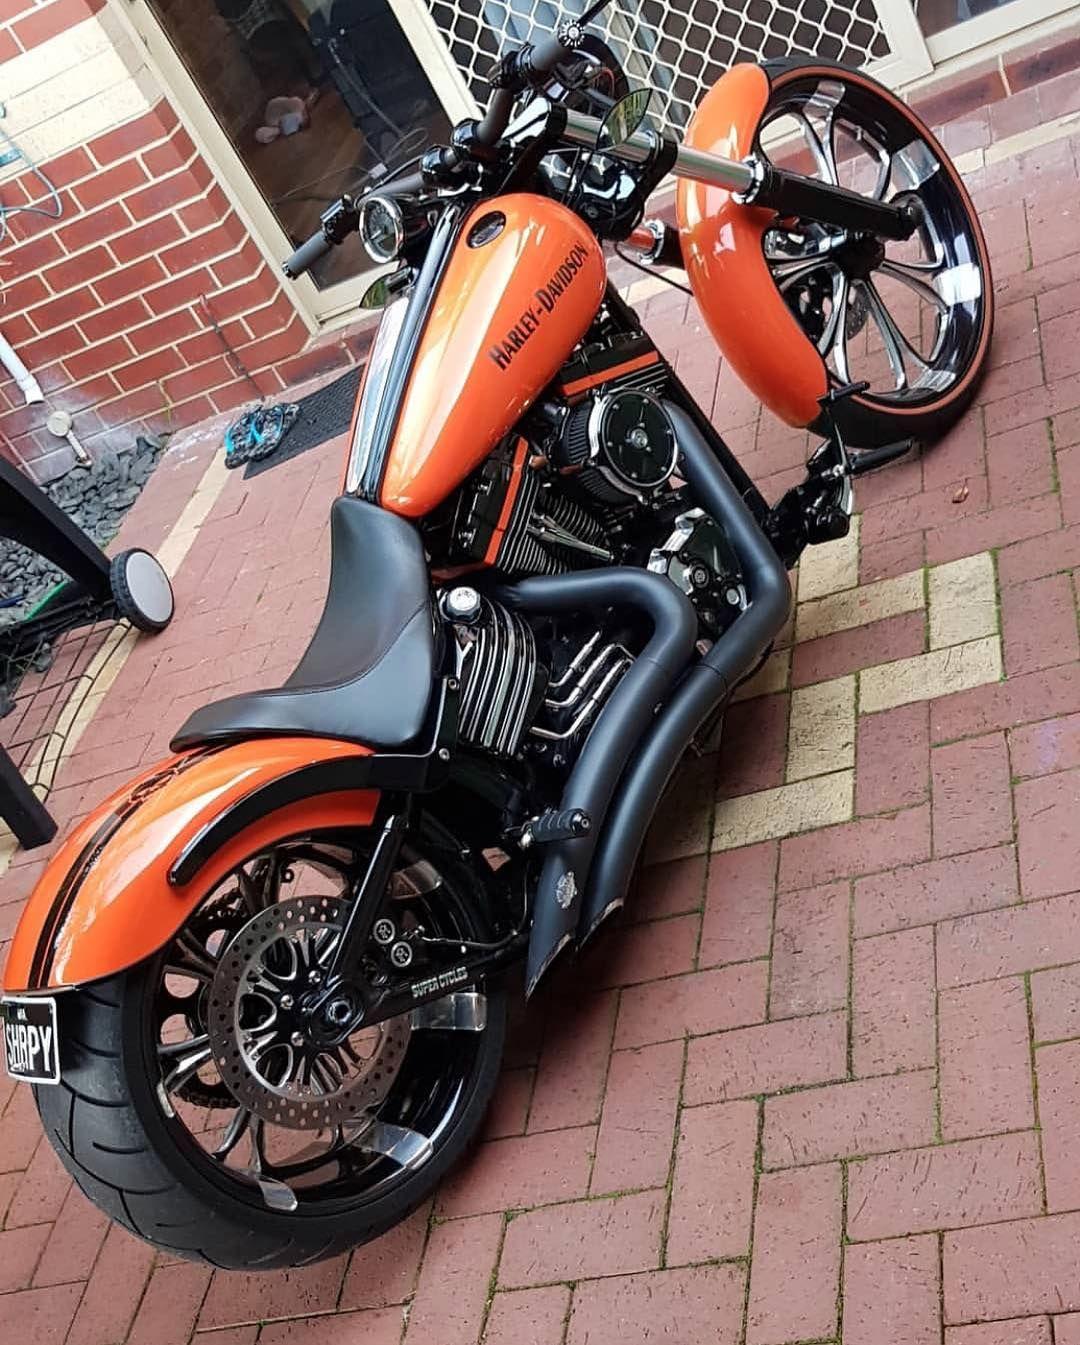 "Australian Harley Scene on Instagram: ""@jantzensharp  #australianharleyscene #harleydavidson #harley #harleydavidsonaustralia #harleysofinstagram #motorcycle #softailheritage…"""